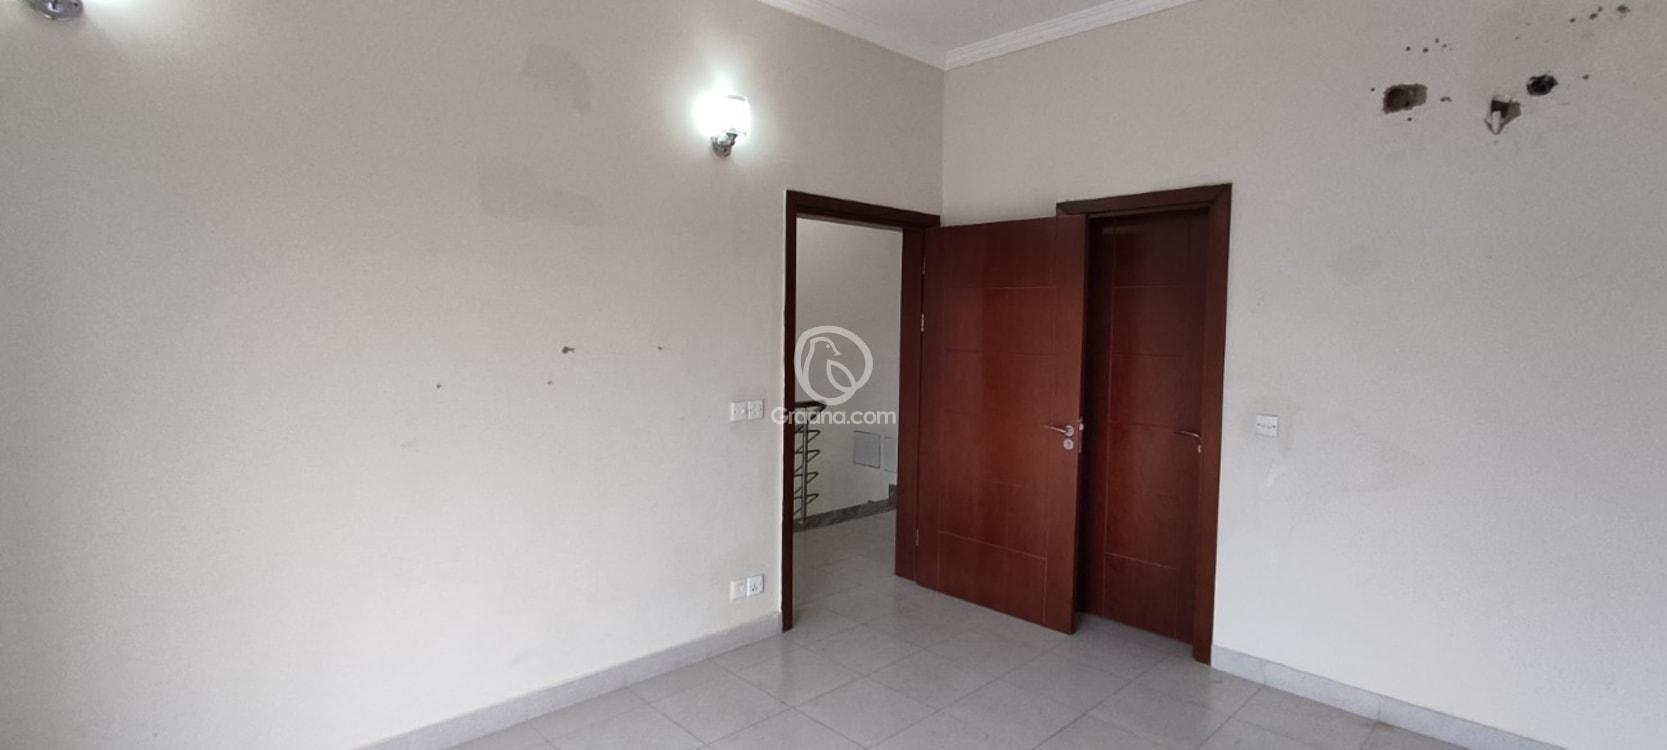 152 Sqyd House for Sale   Graana.com